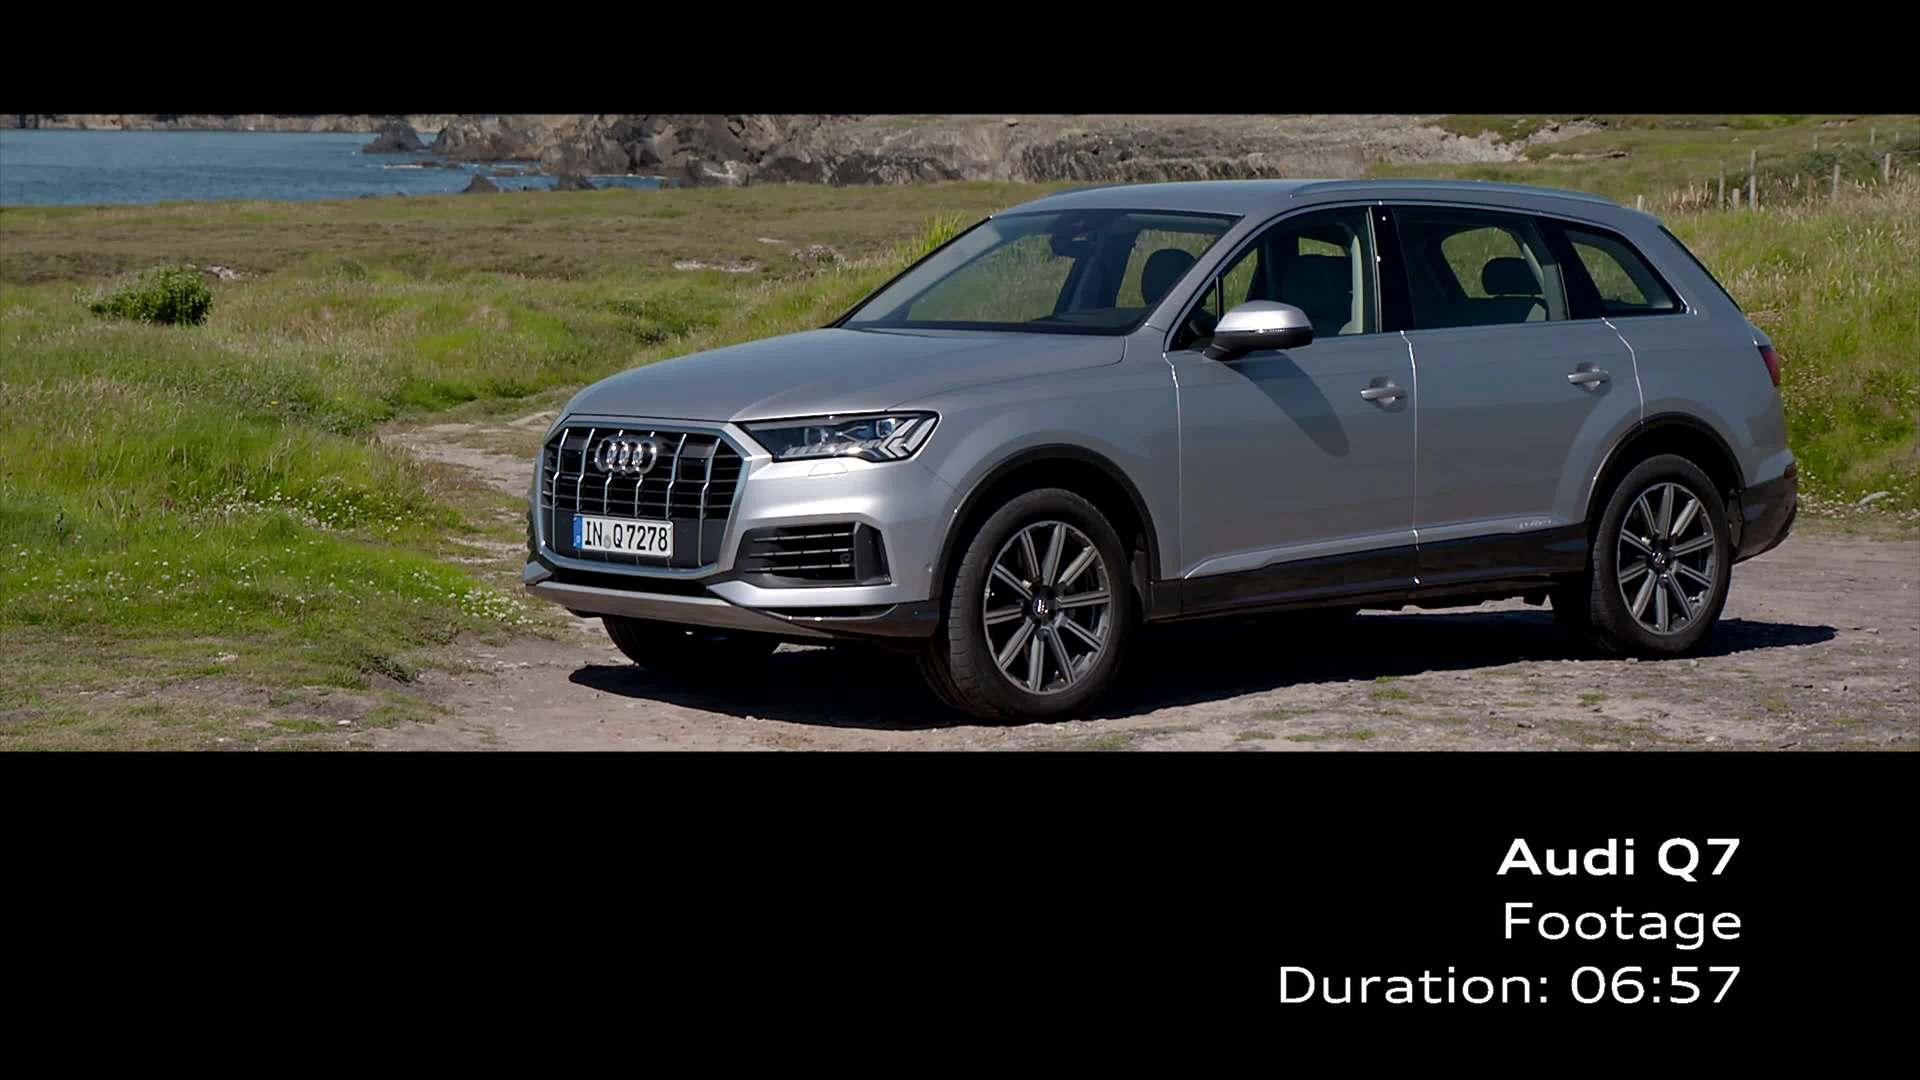 Audi Q7 Florett Silver (Footage)